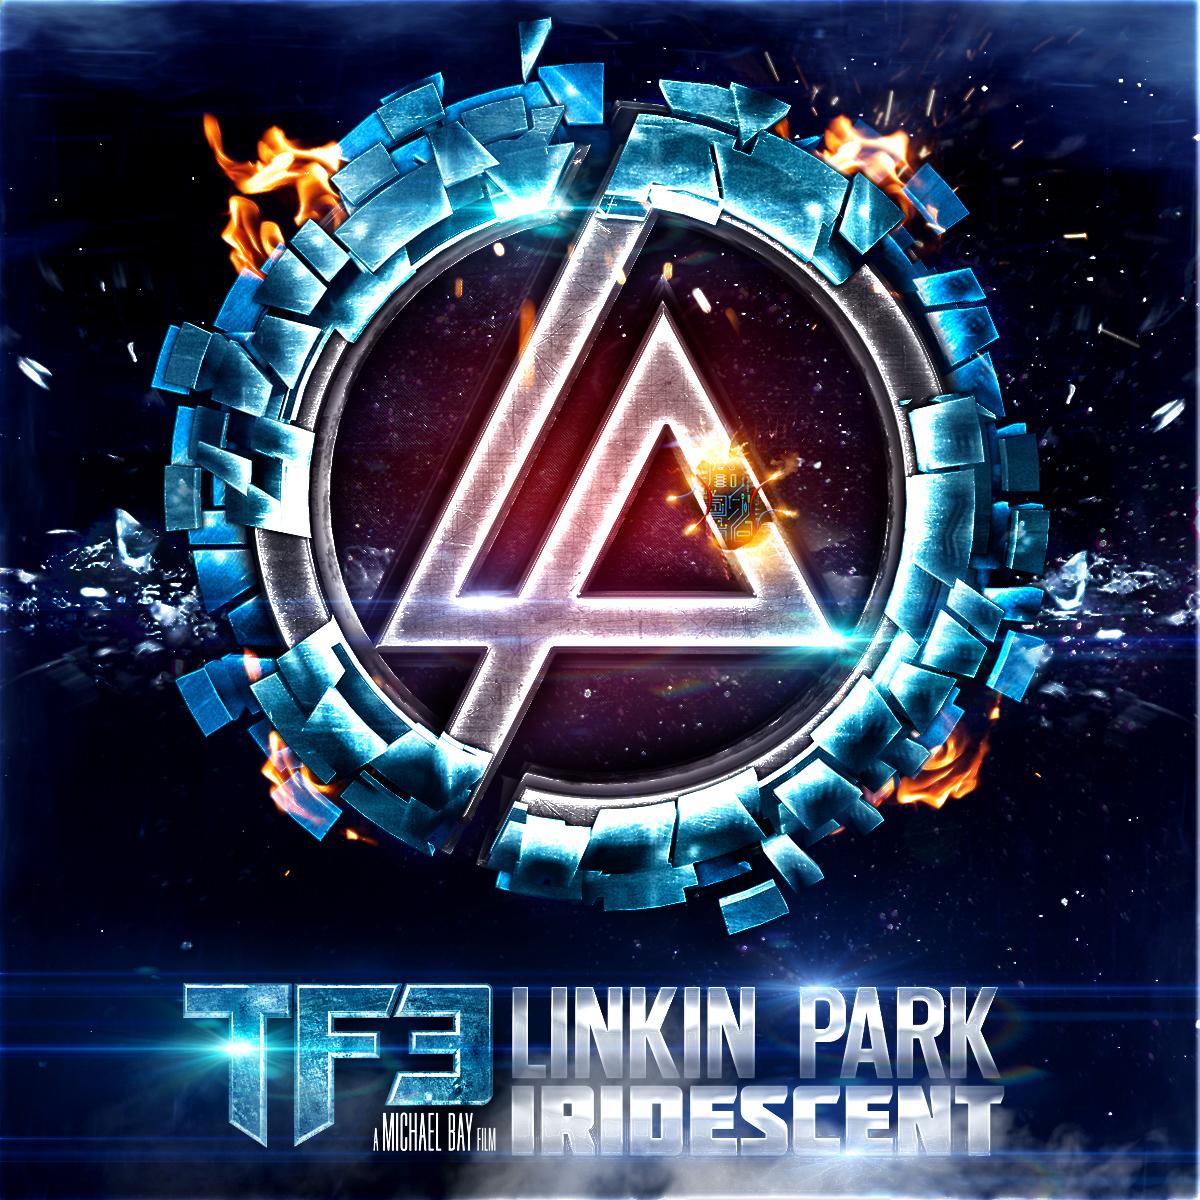 Linkin Park- Iridescent Design